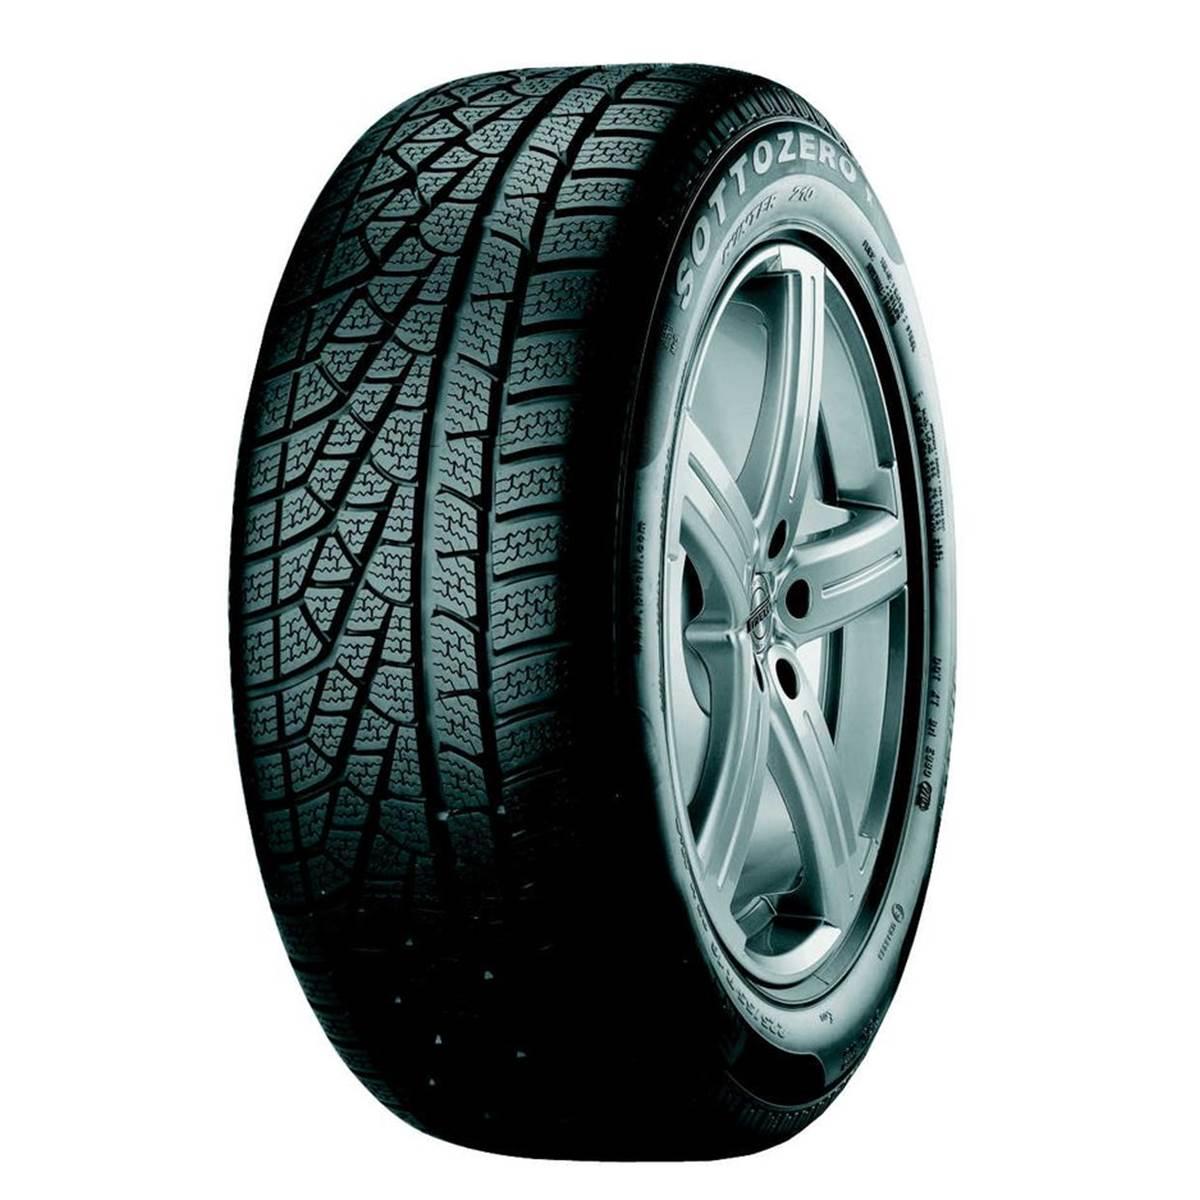 Pneu Runflat Hiver Pirelli 225/45R18 91H Winter Sottozero 3